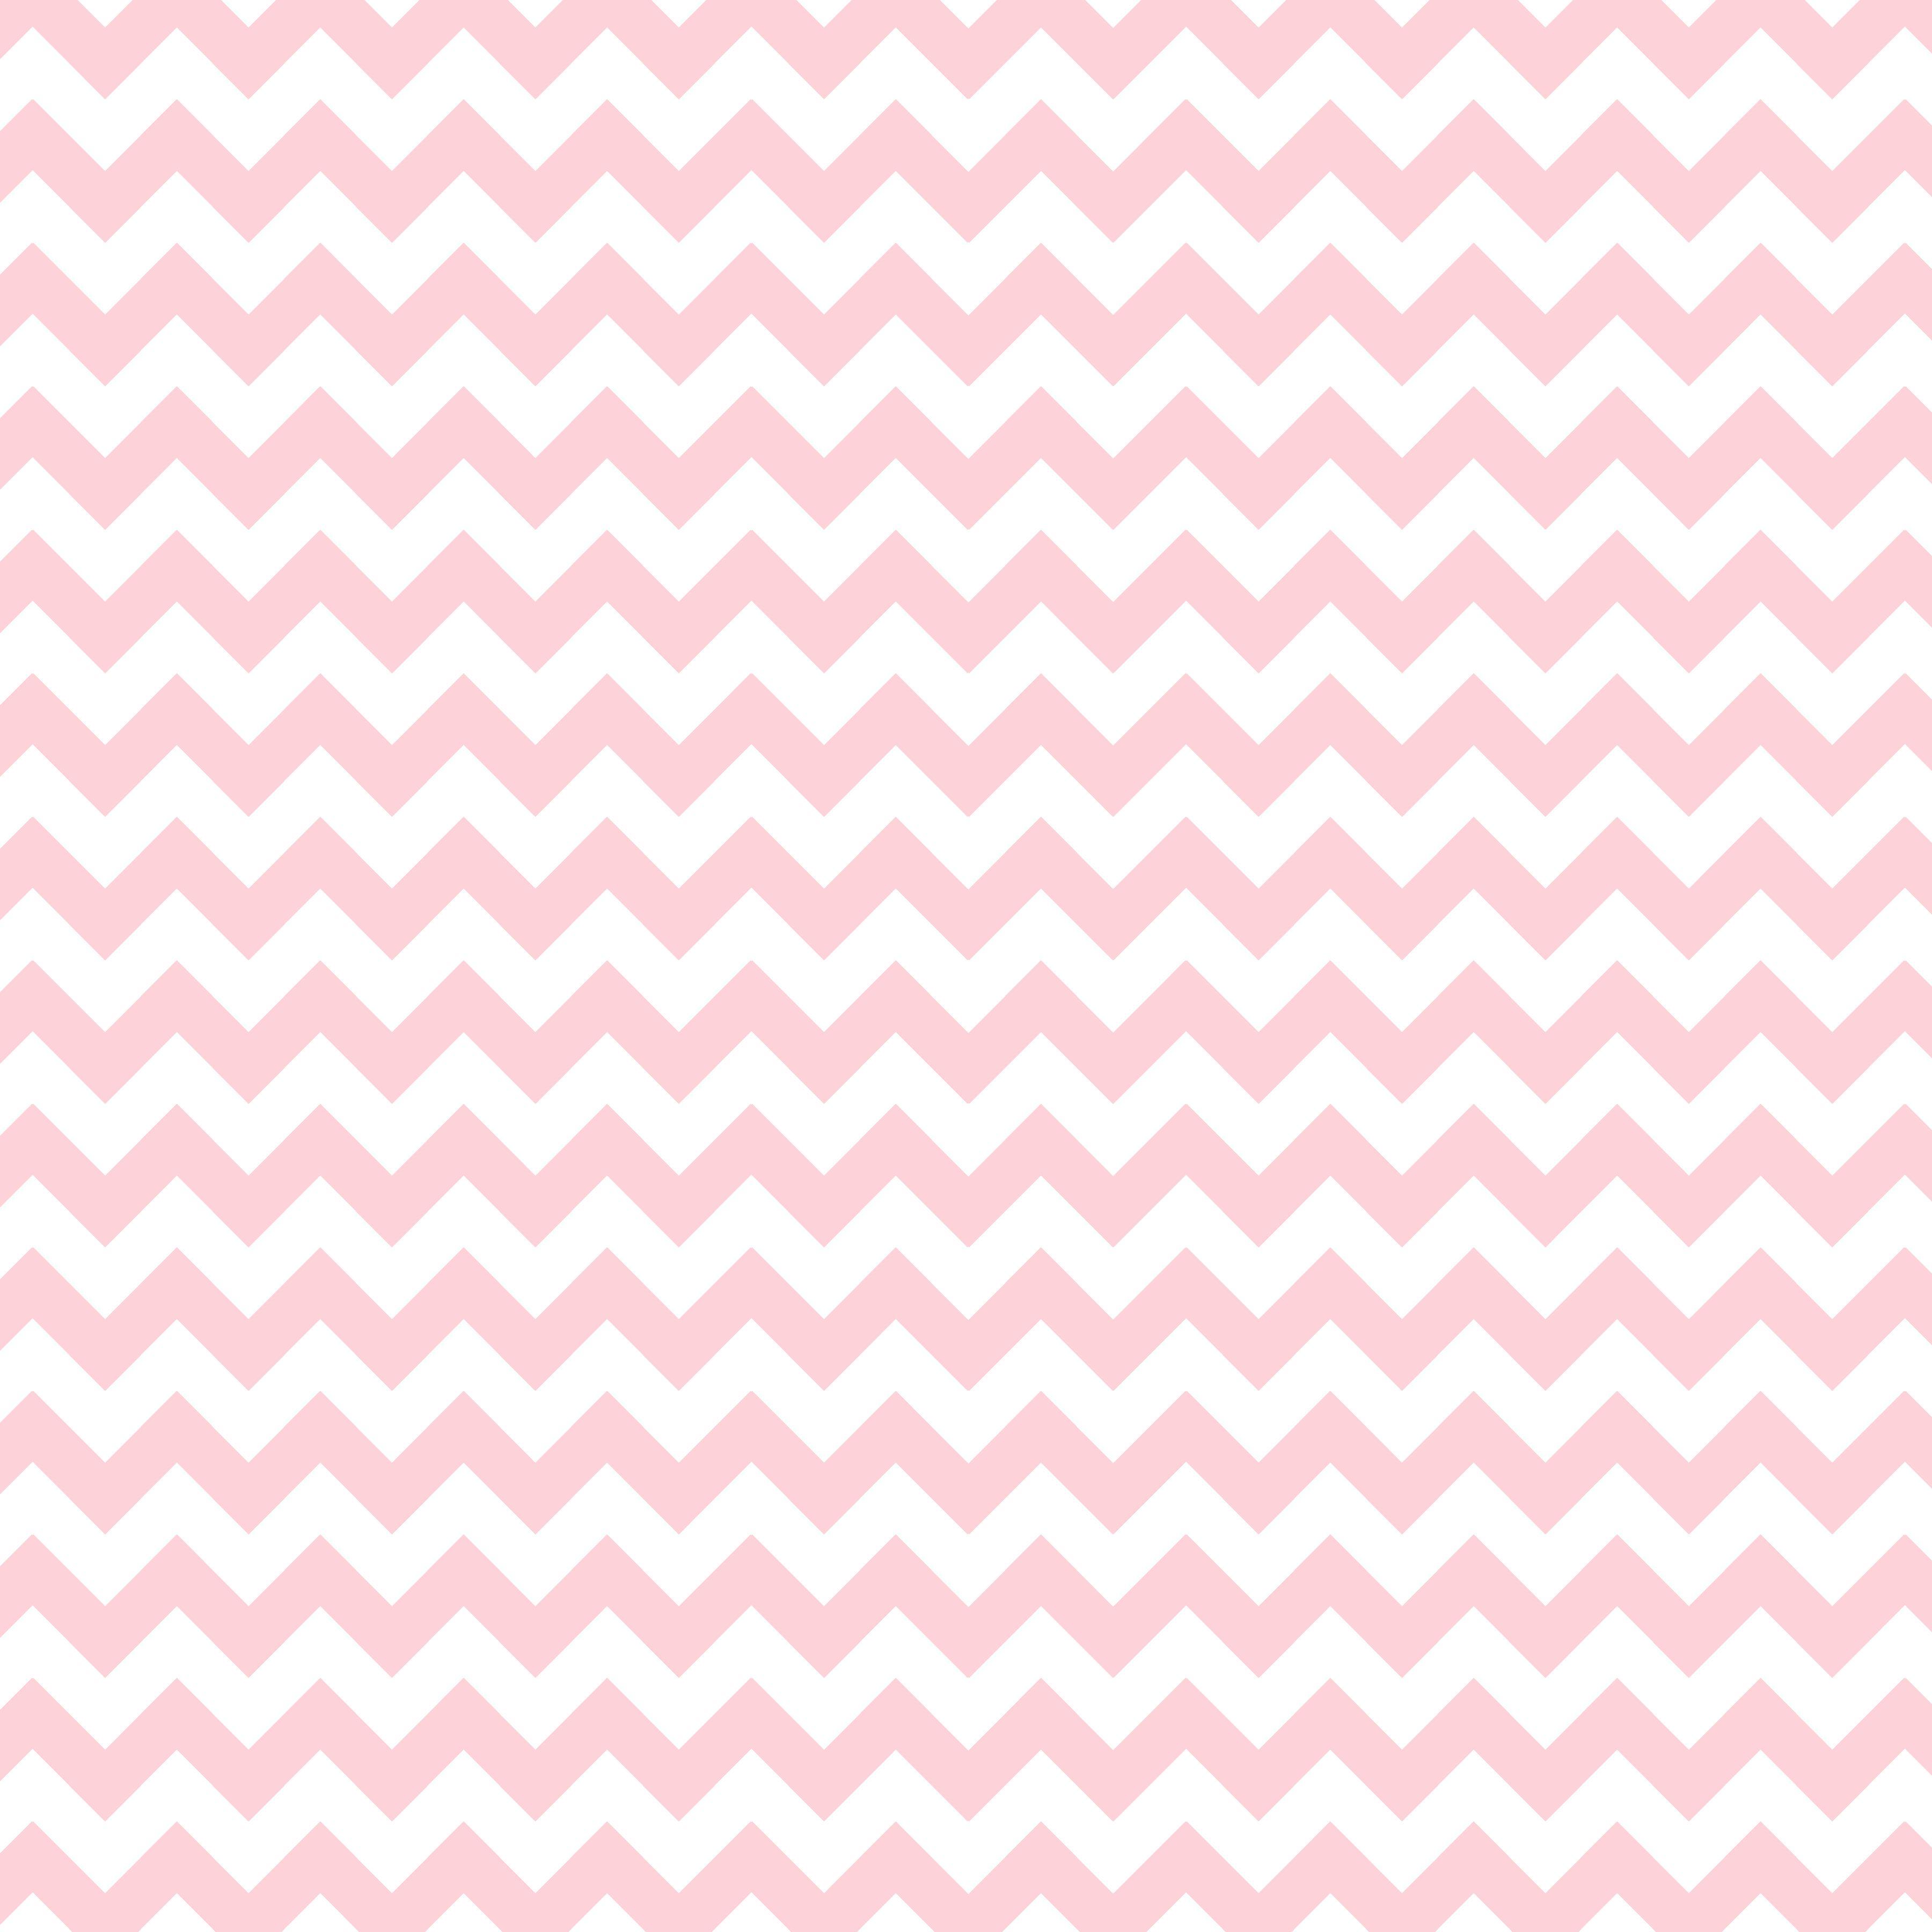 pin pink zig zag - photo #46